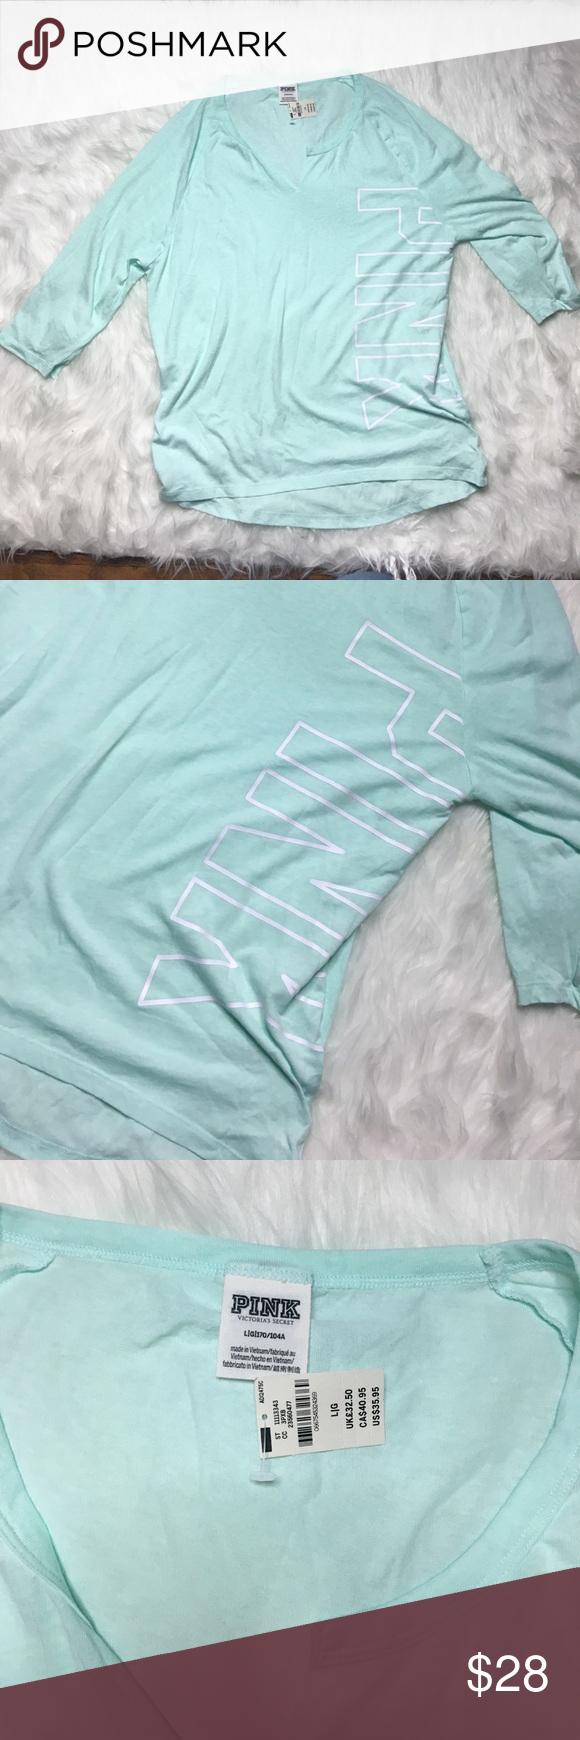 Victoria secret pink mint shirt New with tag size L Victoria's Secret Tops Tees - Short Sleeve